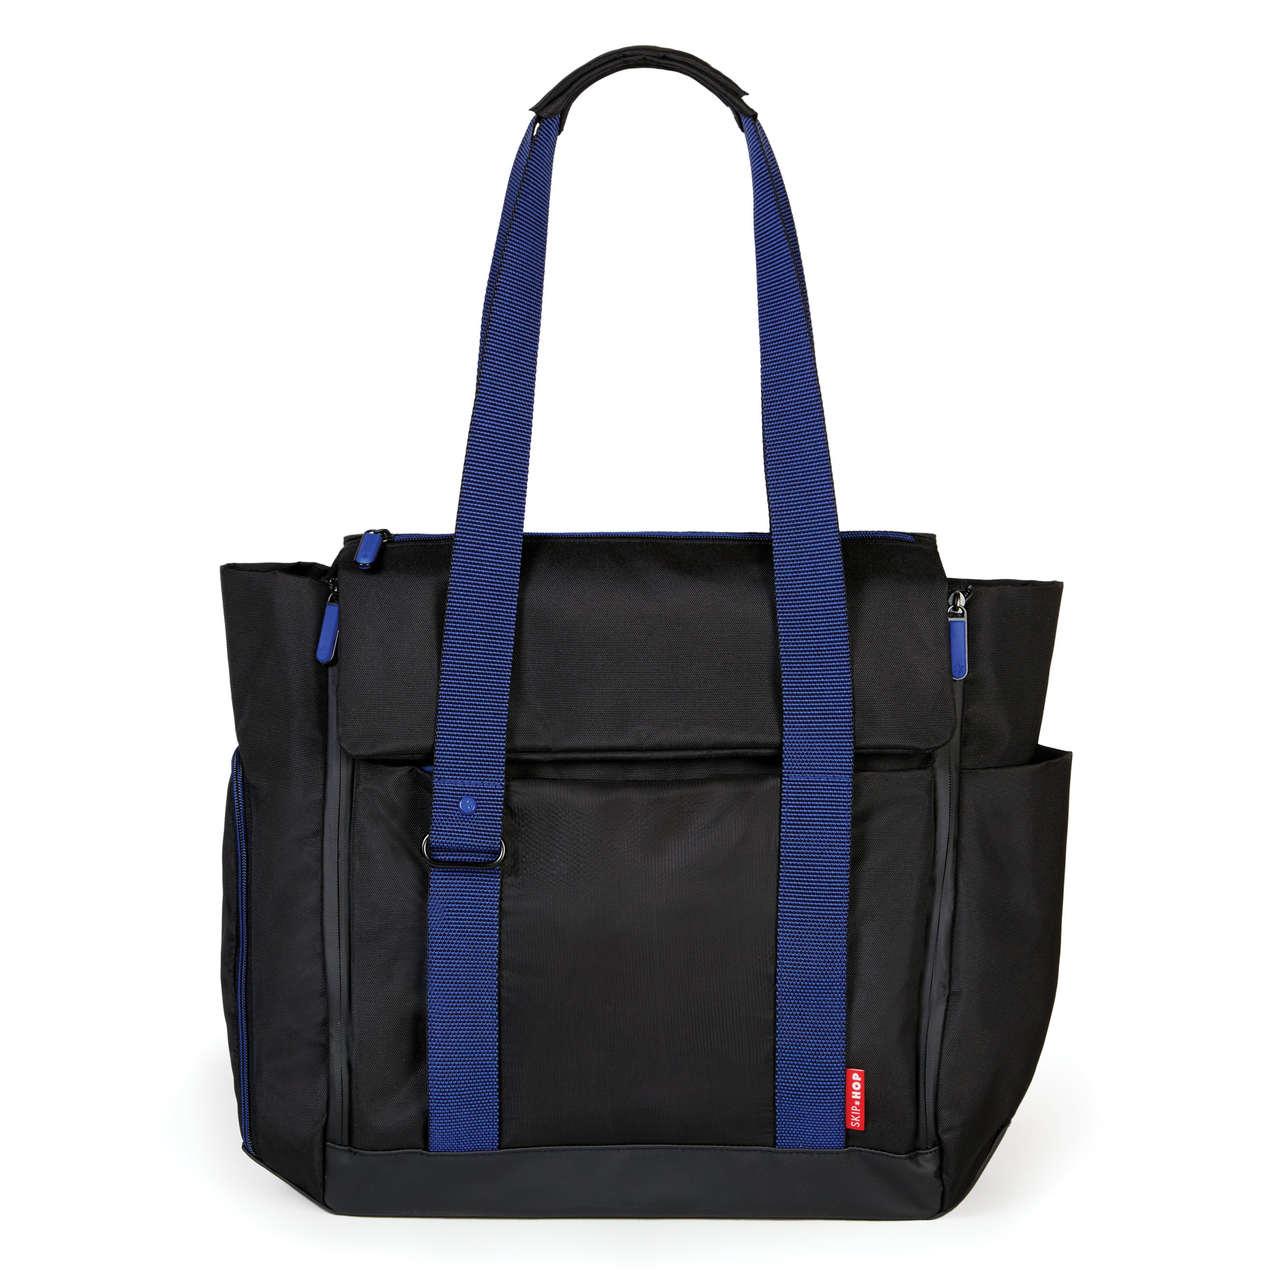 Bolsa Maternidade Skip Hop (Diaper Bag) Fit All Tote